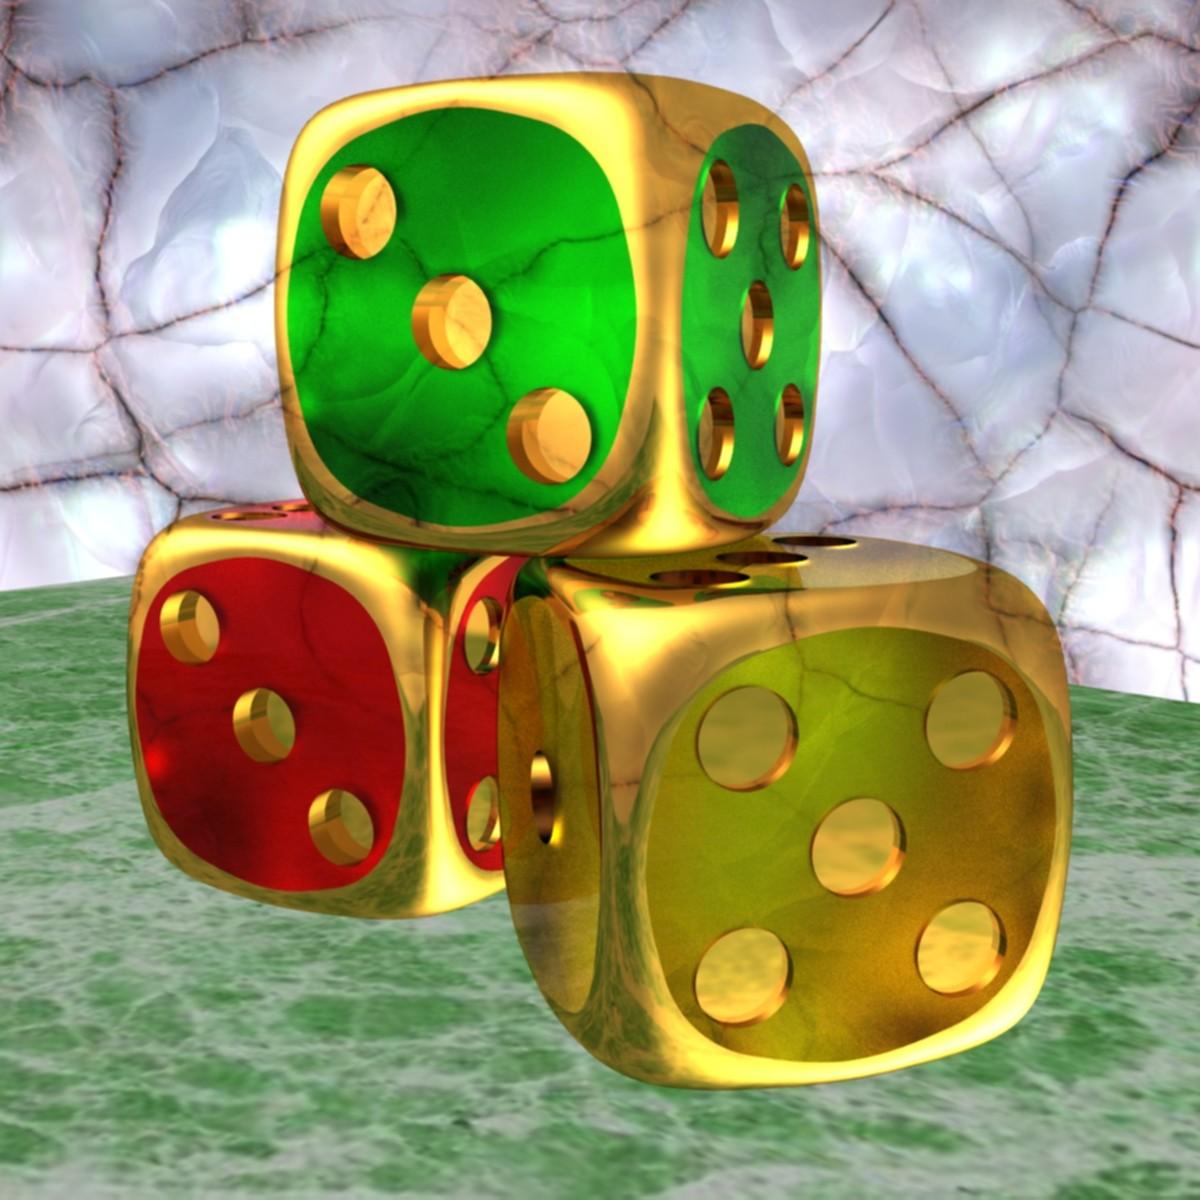 color_glass_dice.jpg